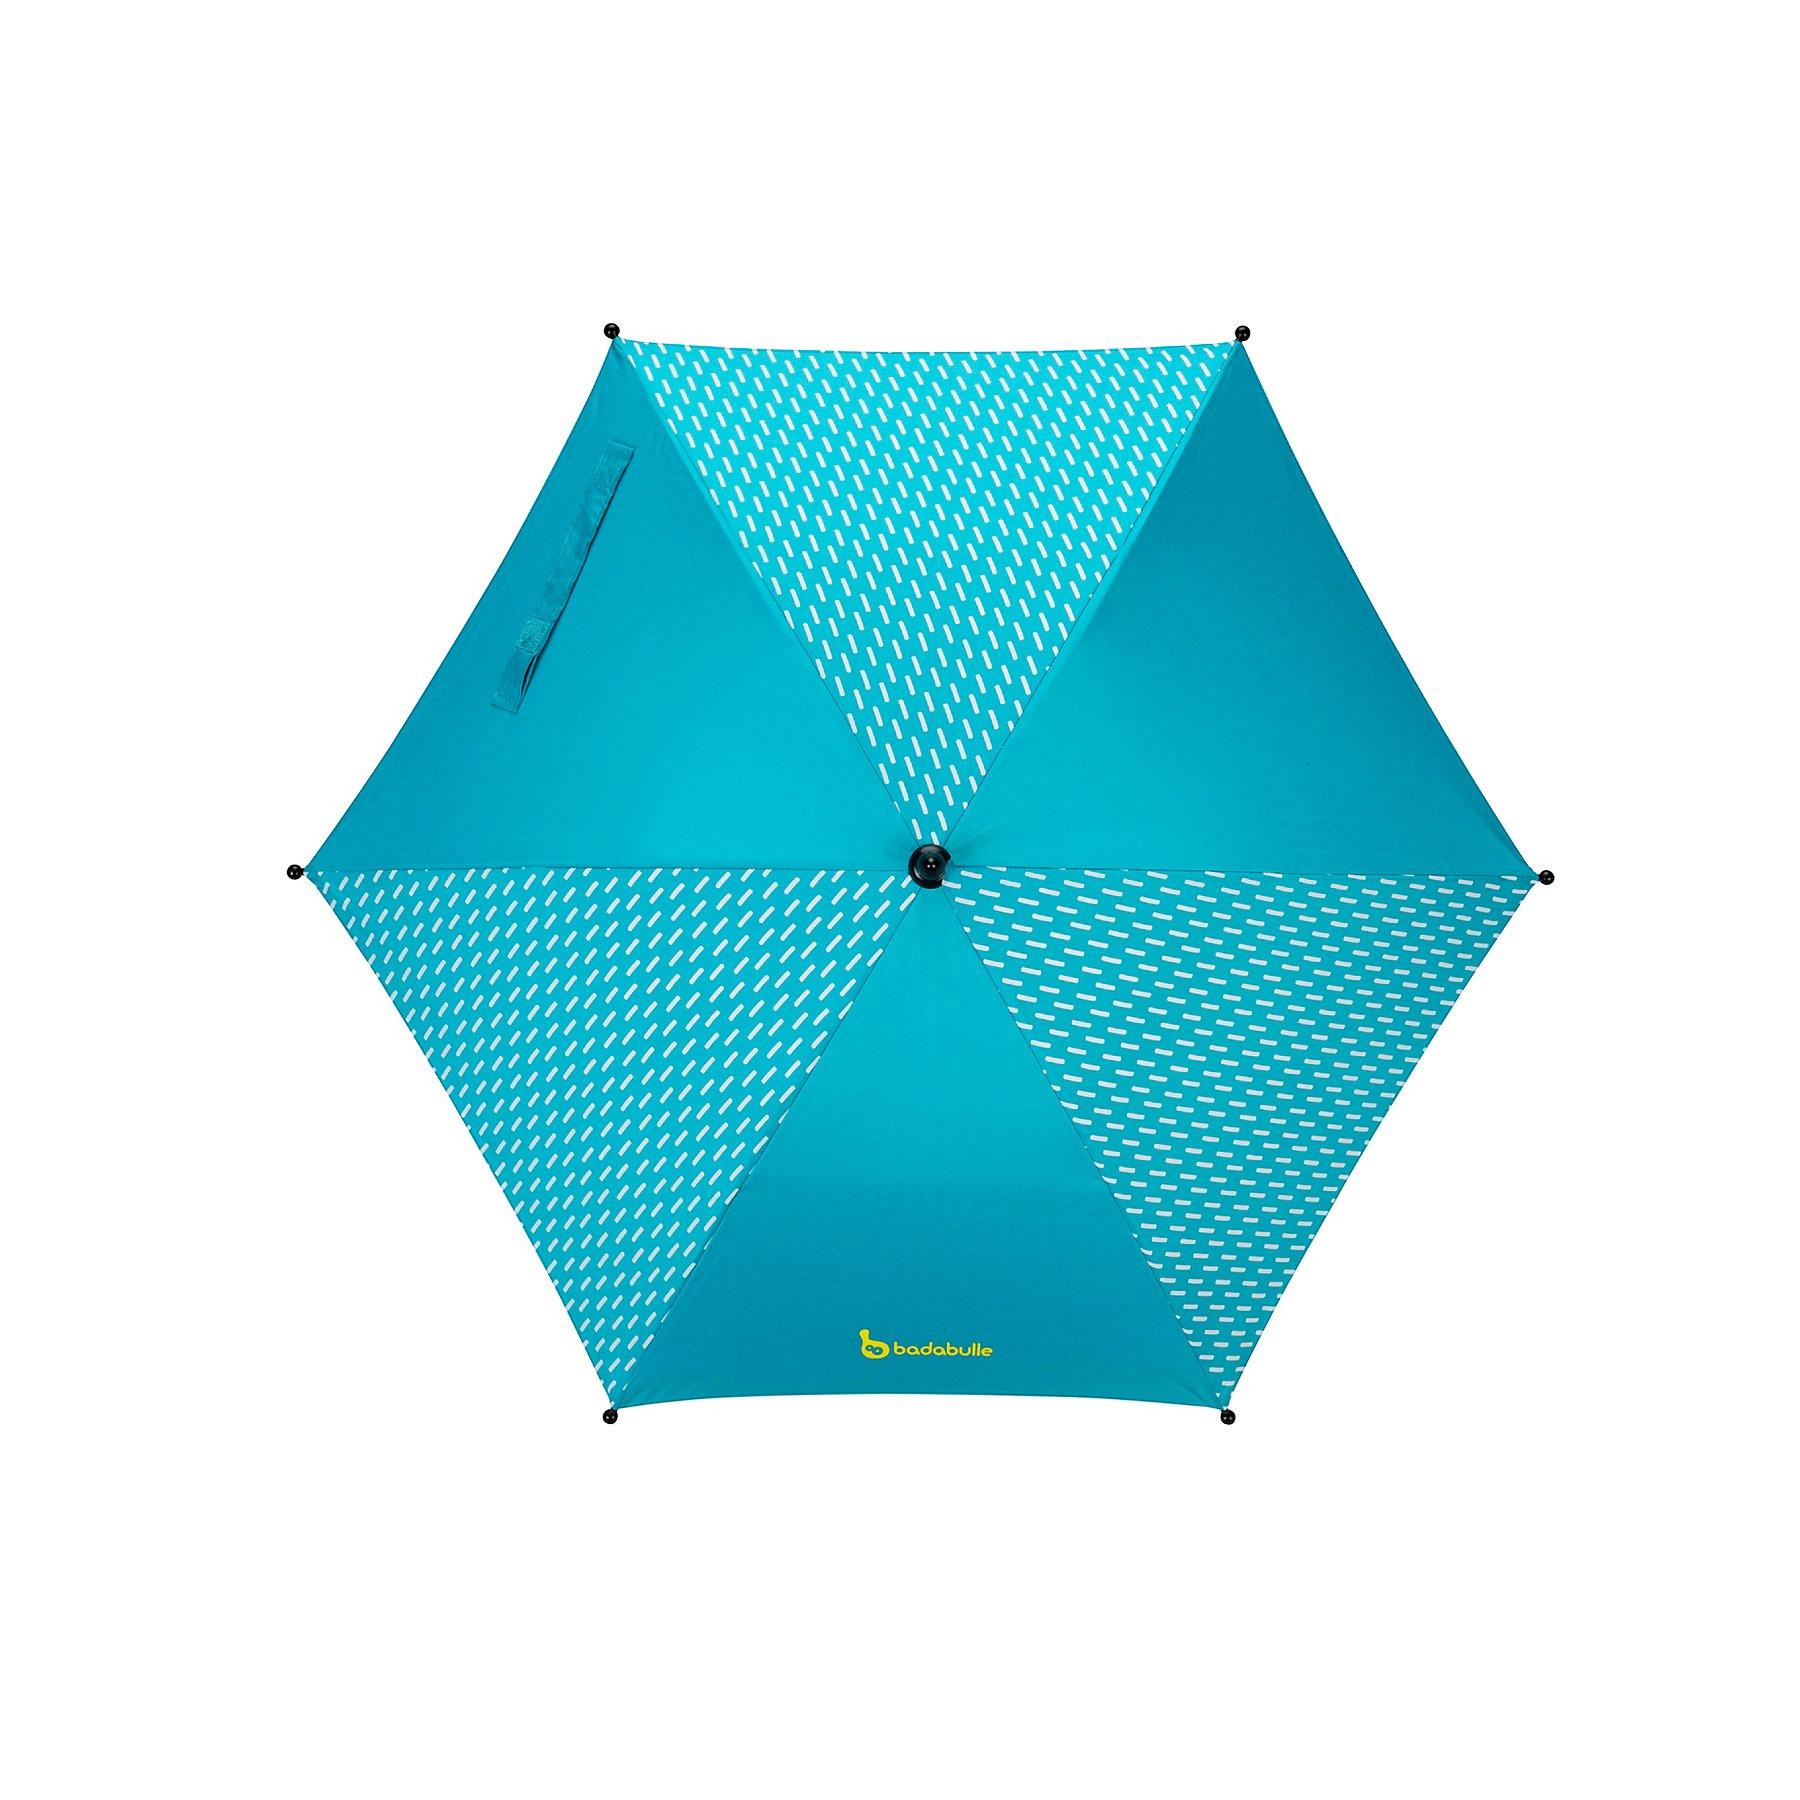 Badabulle Uv Parasol Umbrella Blue